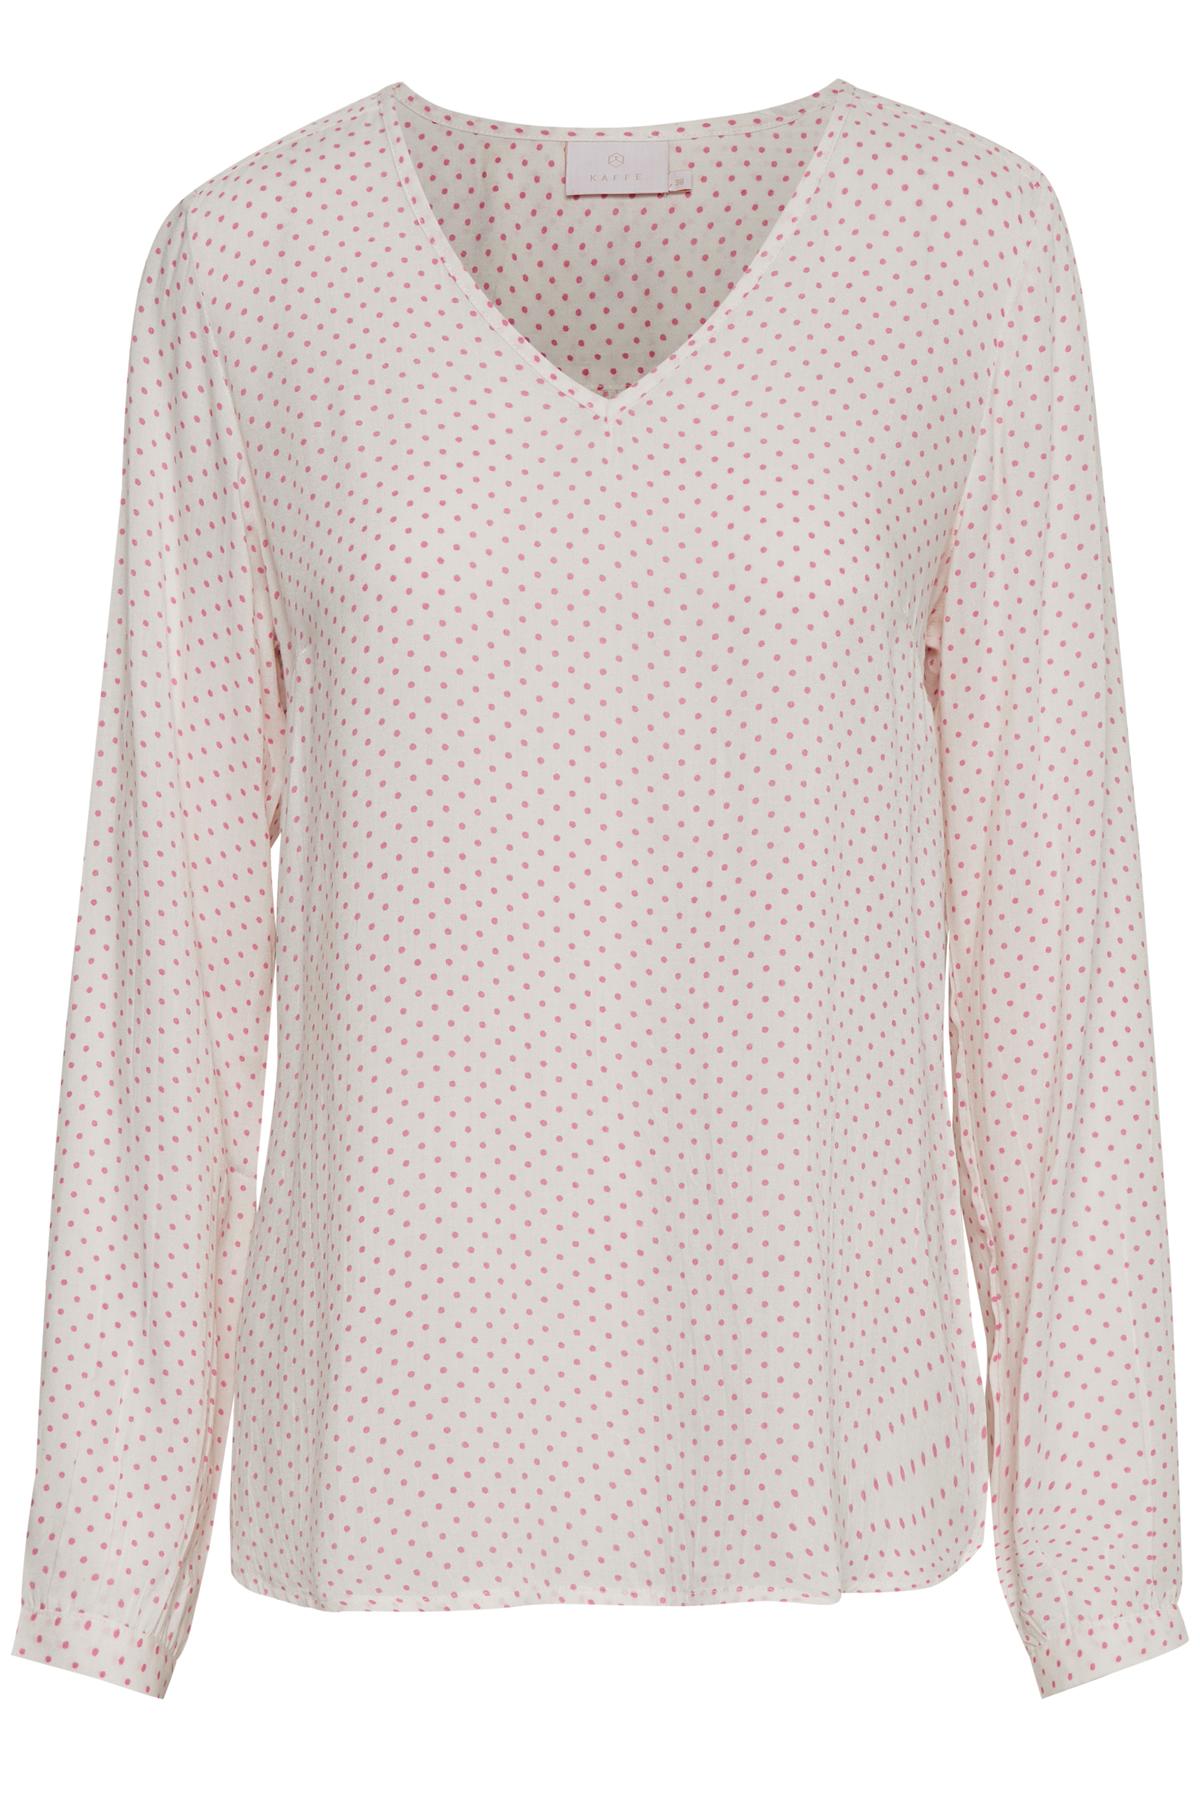 Wollweiß/rosa Langarm-Bluse von Kaffe – Shoppen Sie Wollweiß/rosa Langarm-Bluse ab Gr. 34-46 hier